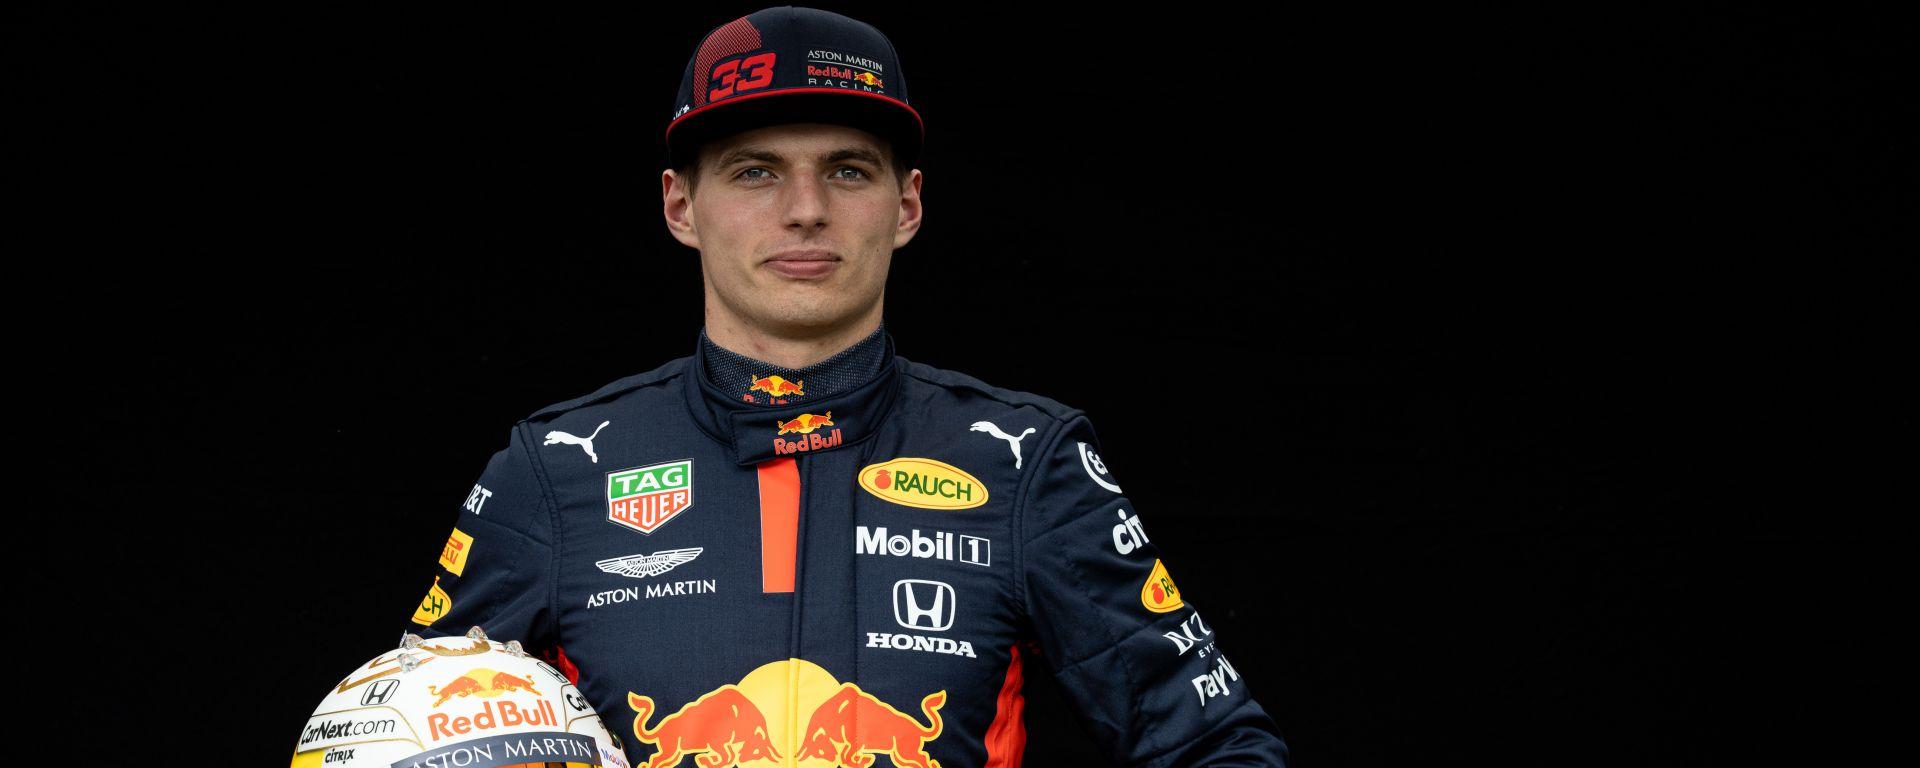 F1 GP Australia 2020, Melbourne: Max Verstappen (Red Bull)